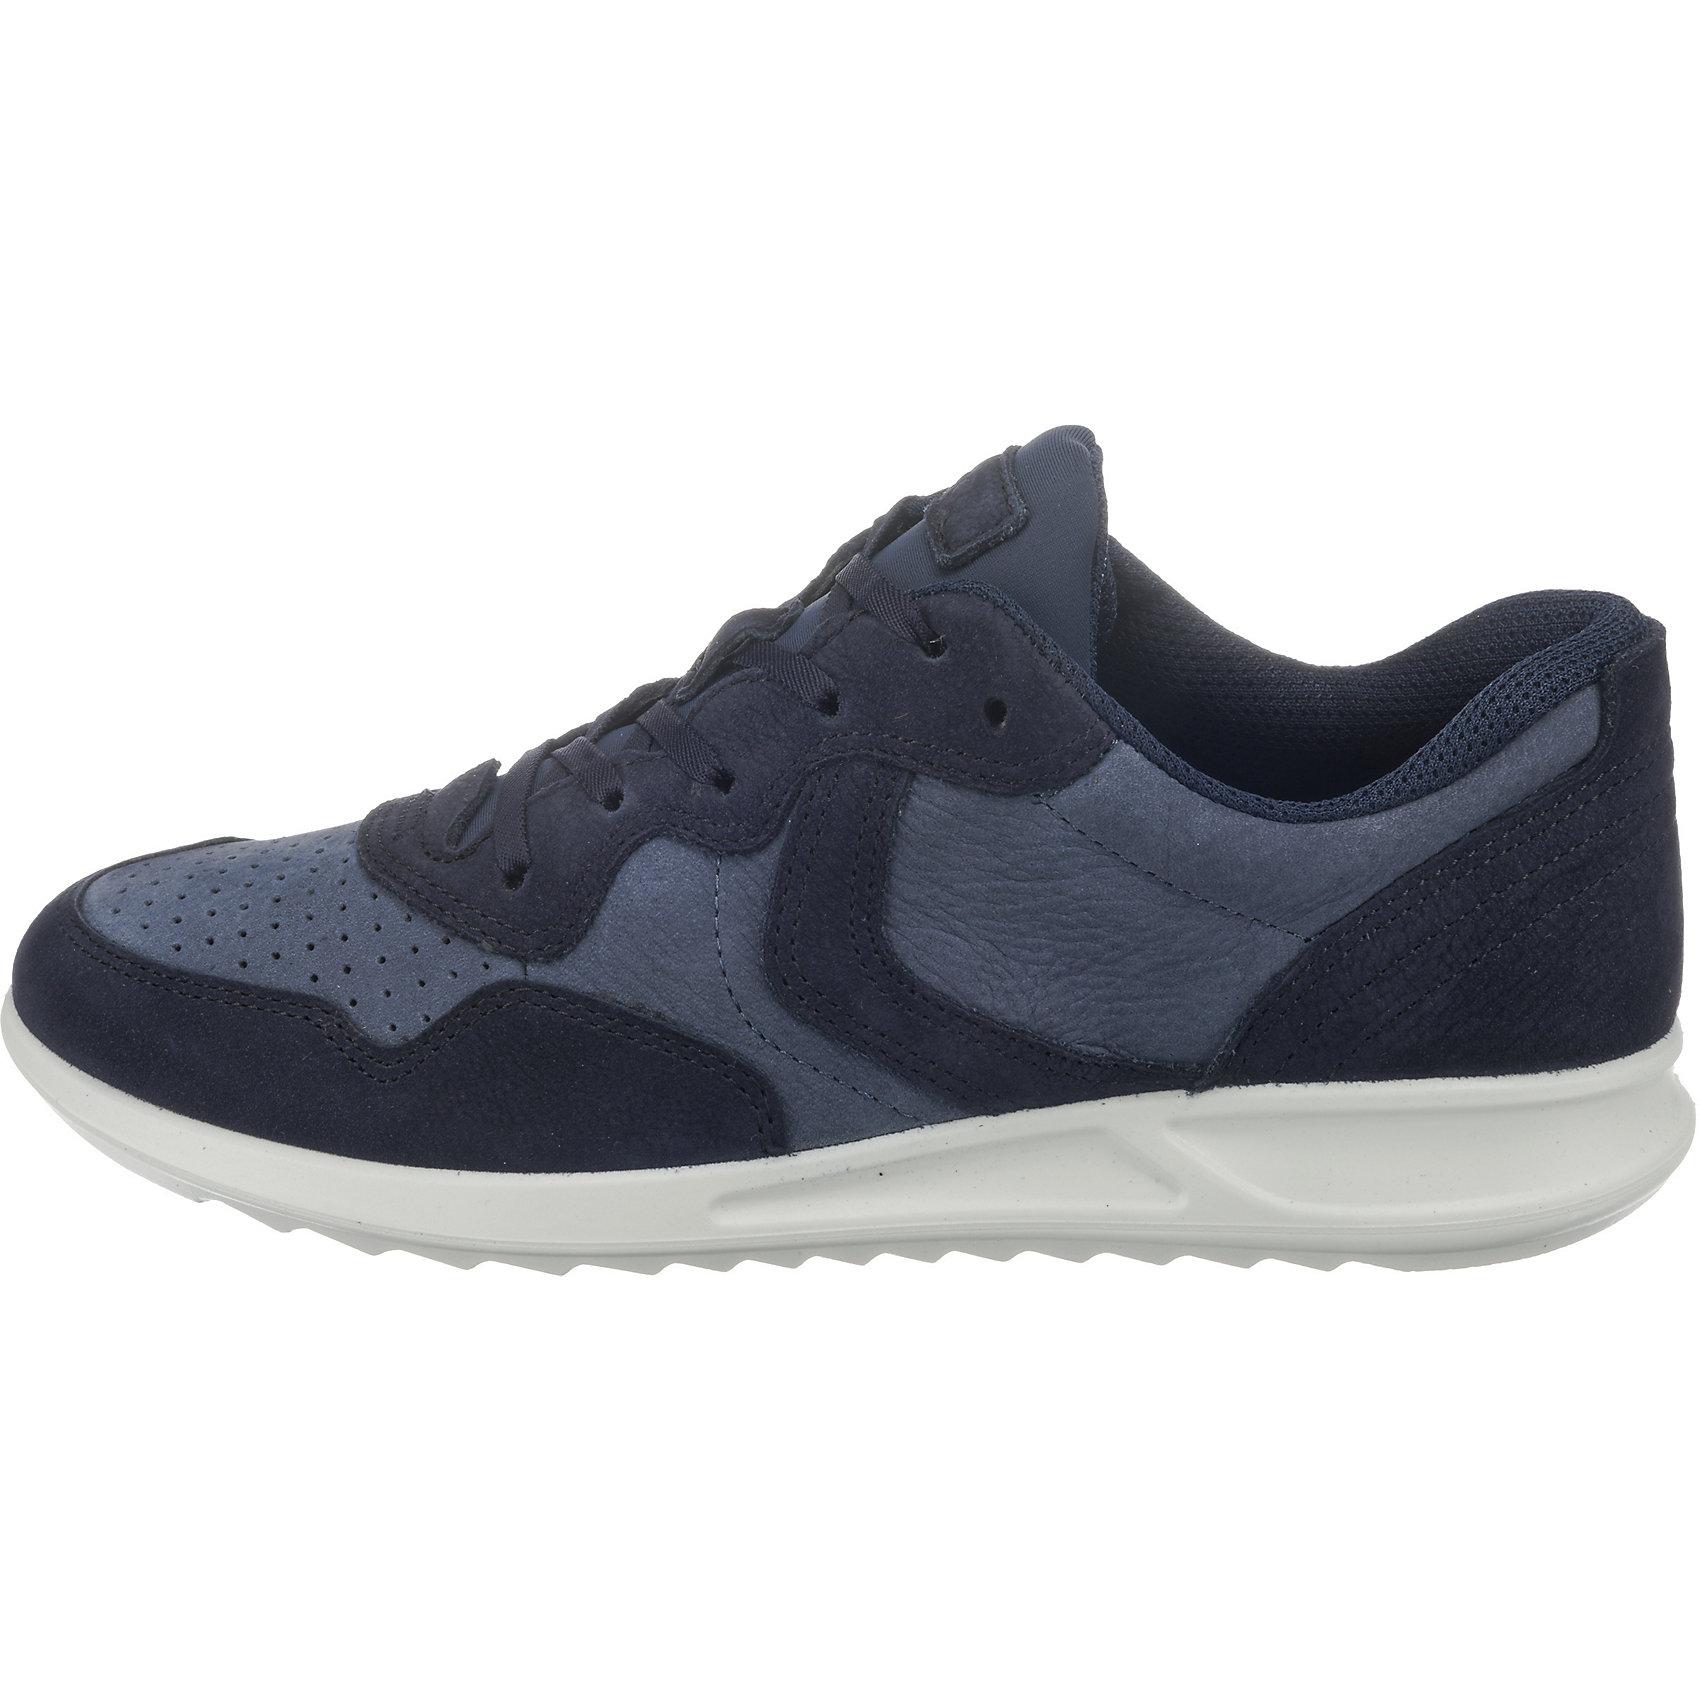 Ecco ecco Soft 5 Black Feather Sneakers Low, blau, blau